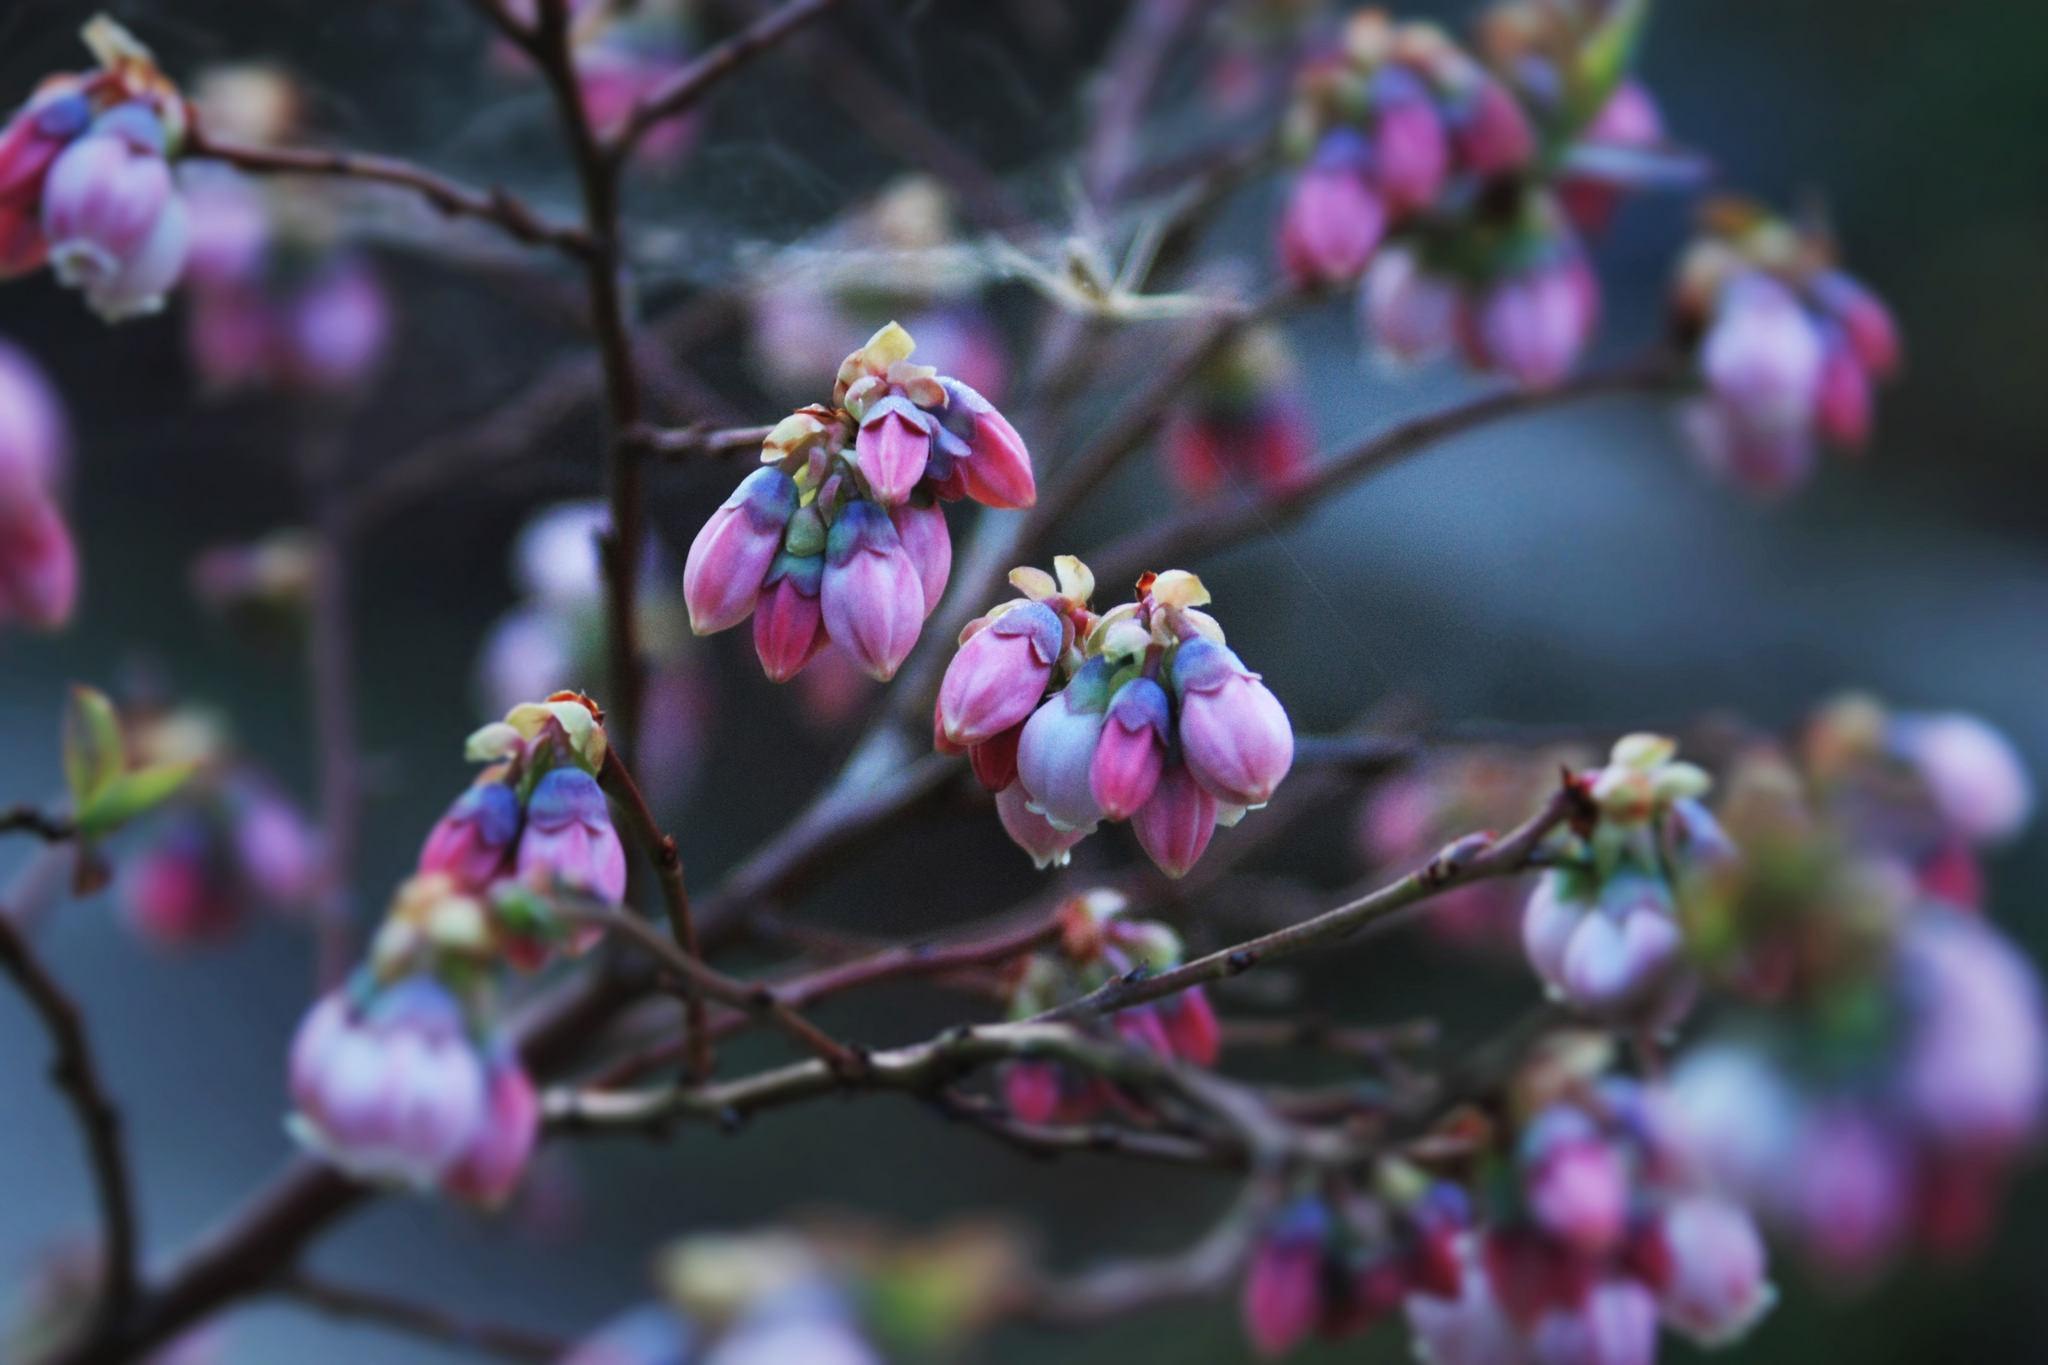 Highbush Blueberry by Kai